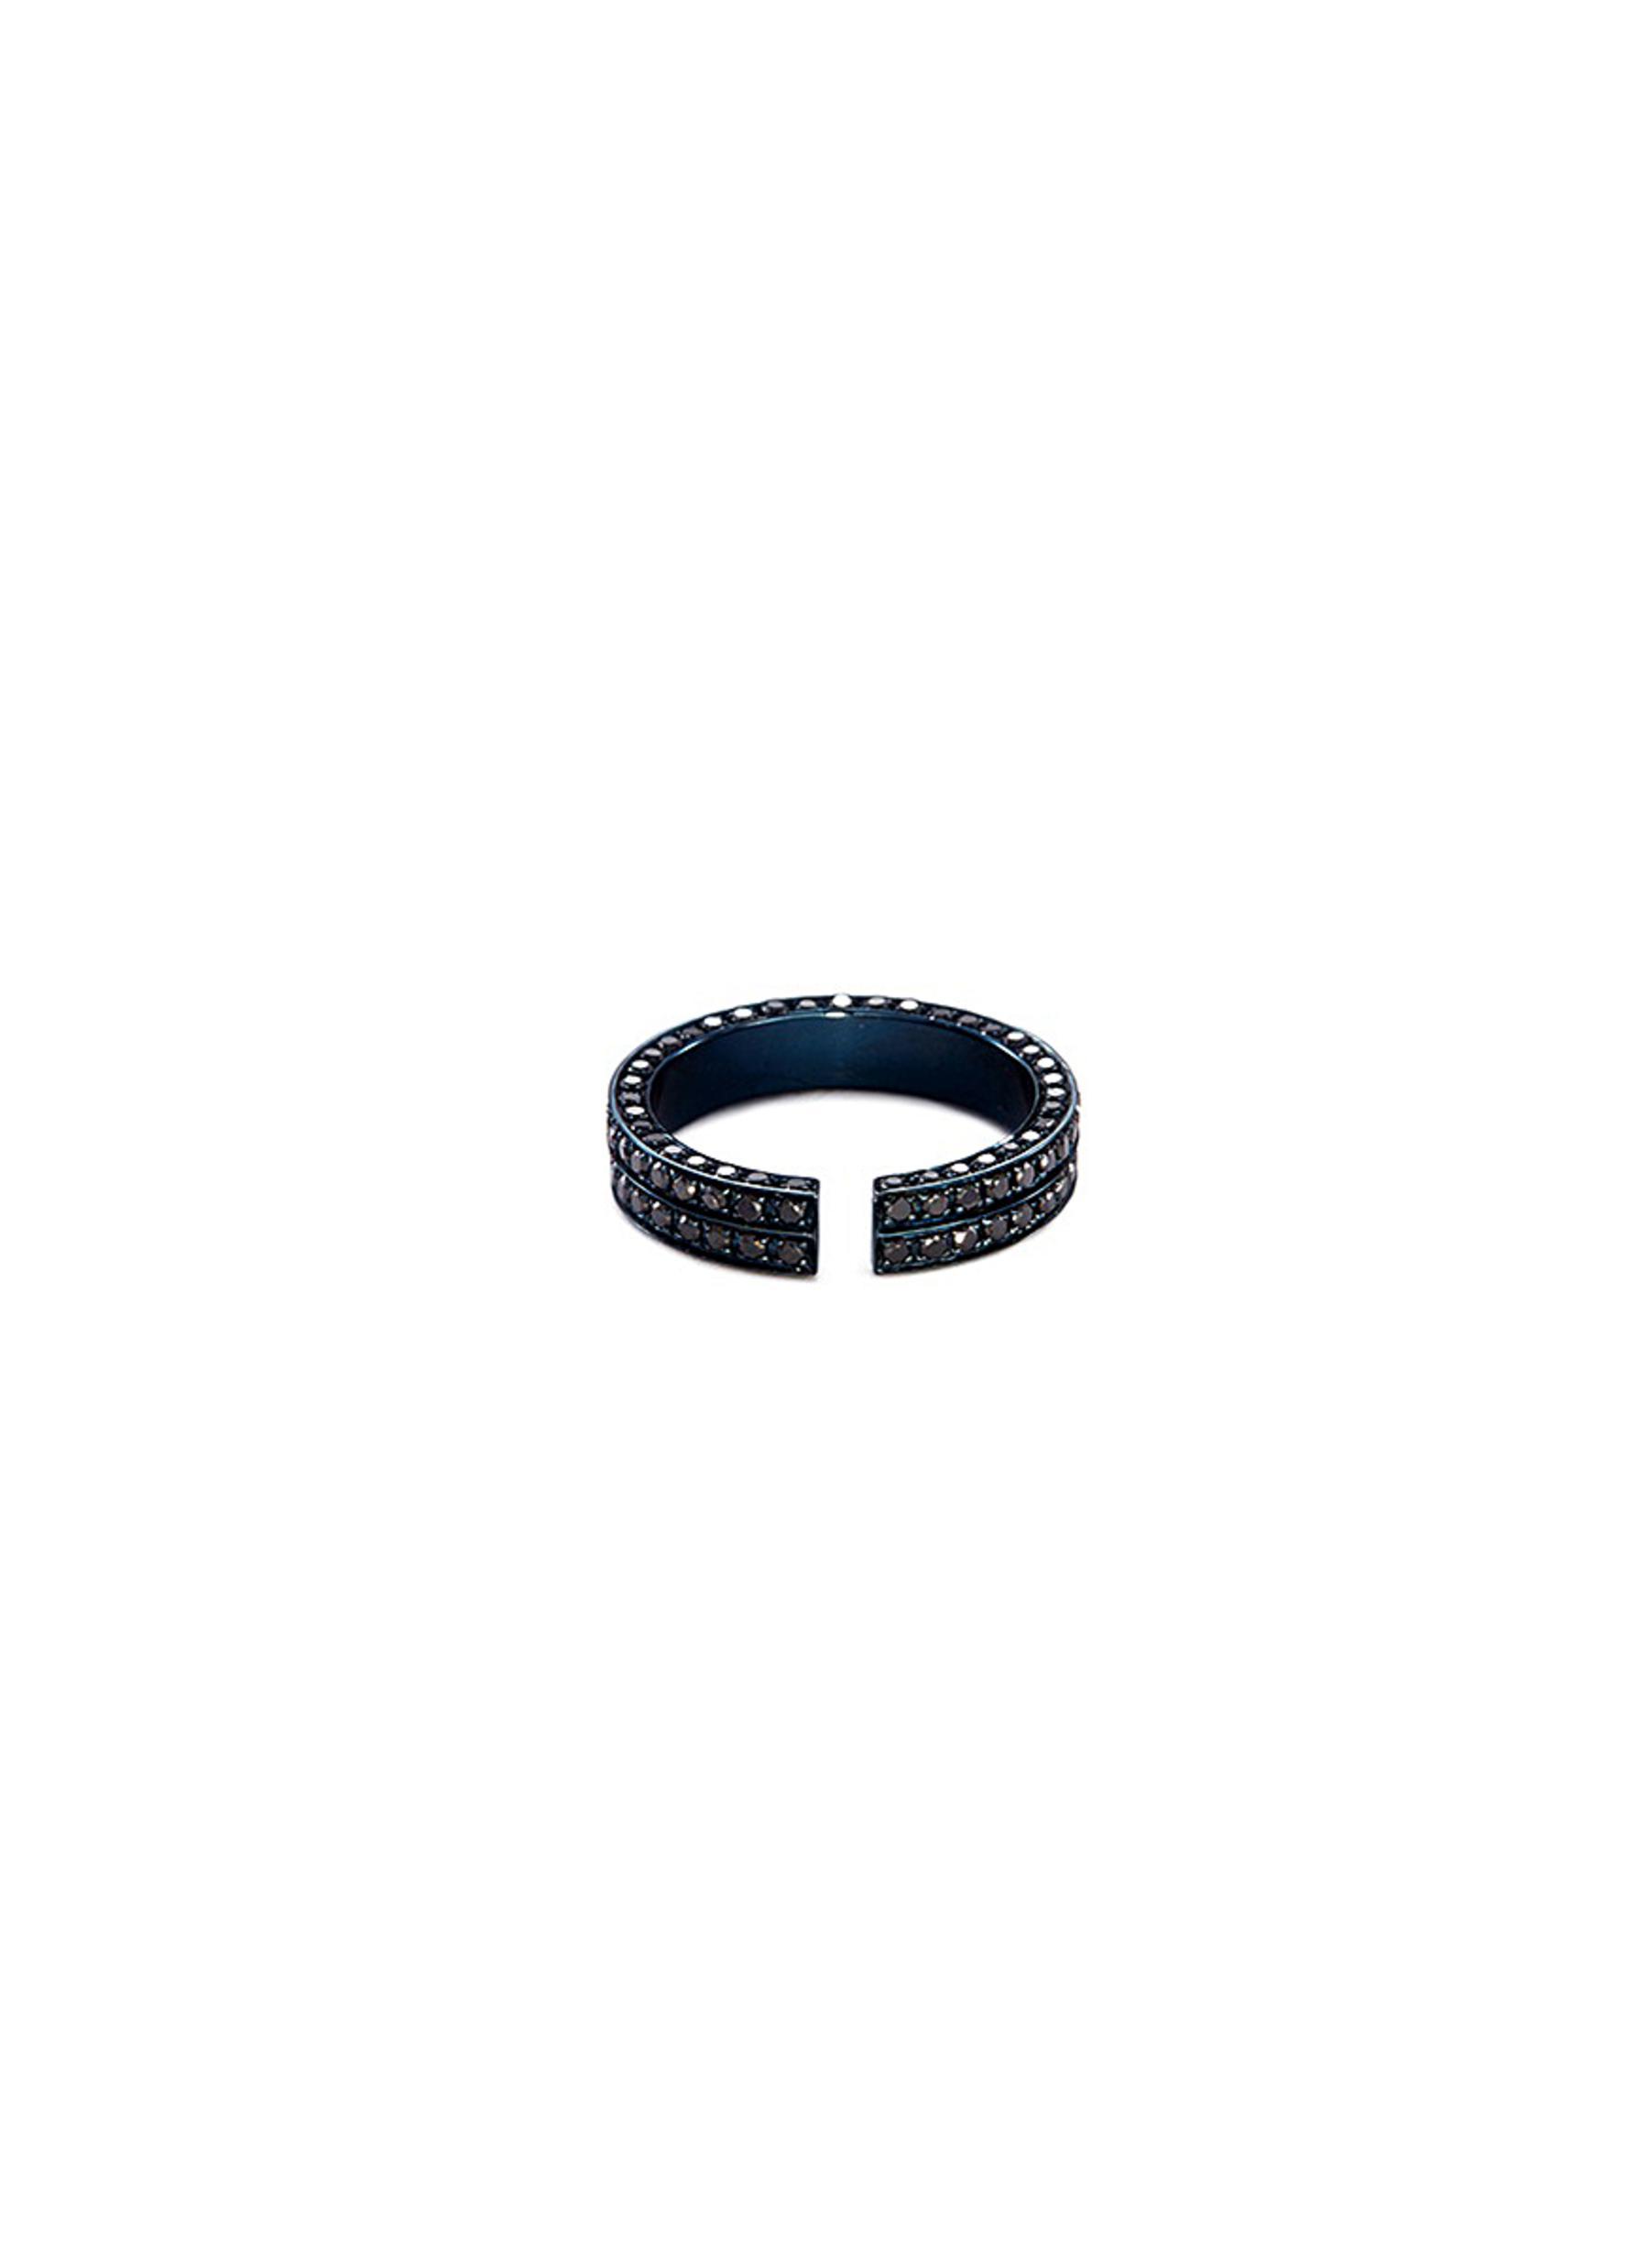 Diamond rhodium plated 18k white gold open ring